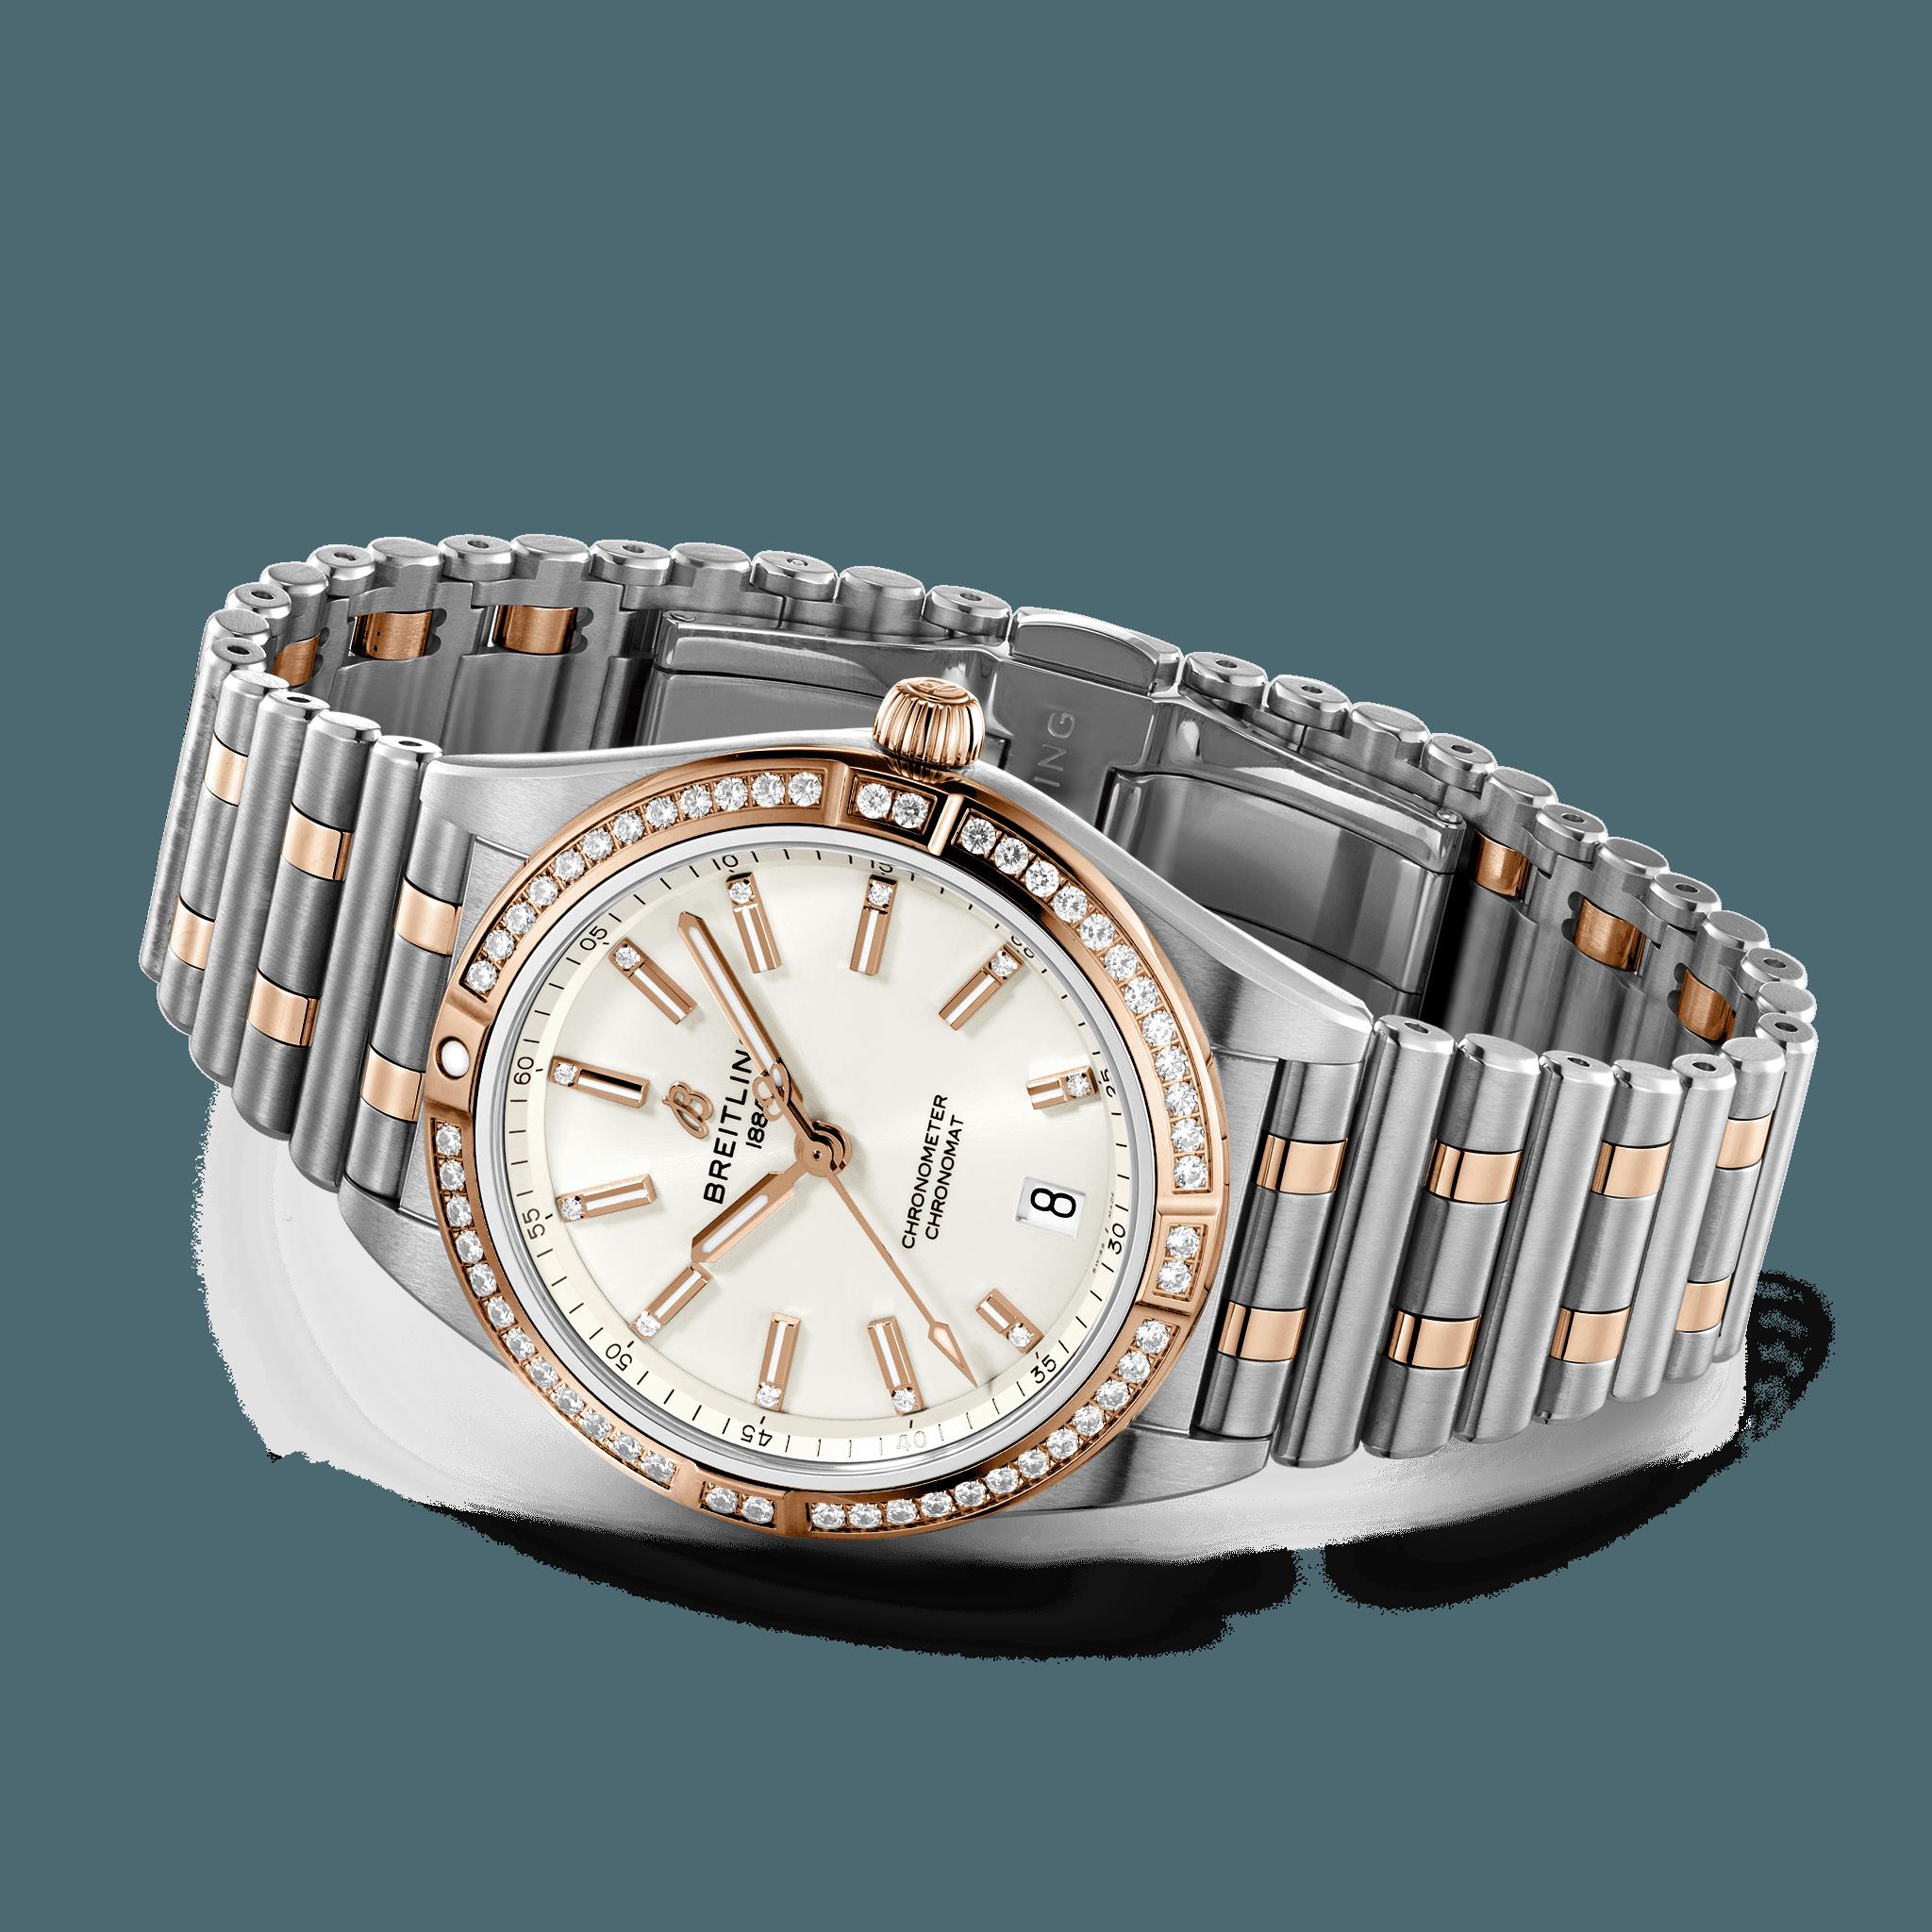 Breitling Chronomat Automatic 36mm Diamantlunette Ref. u10380591a1u1